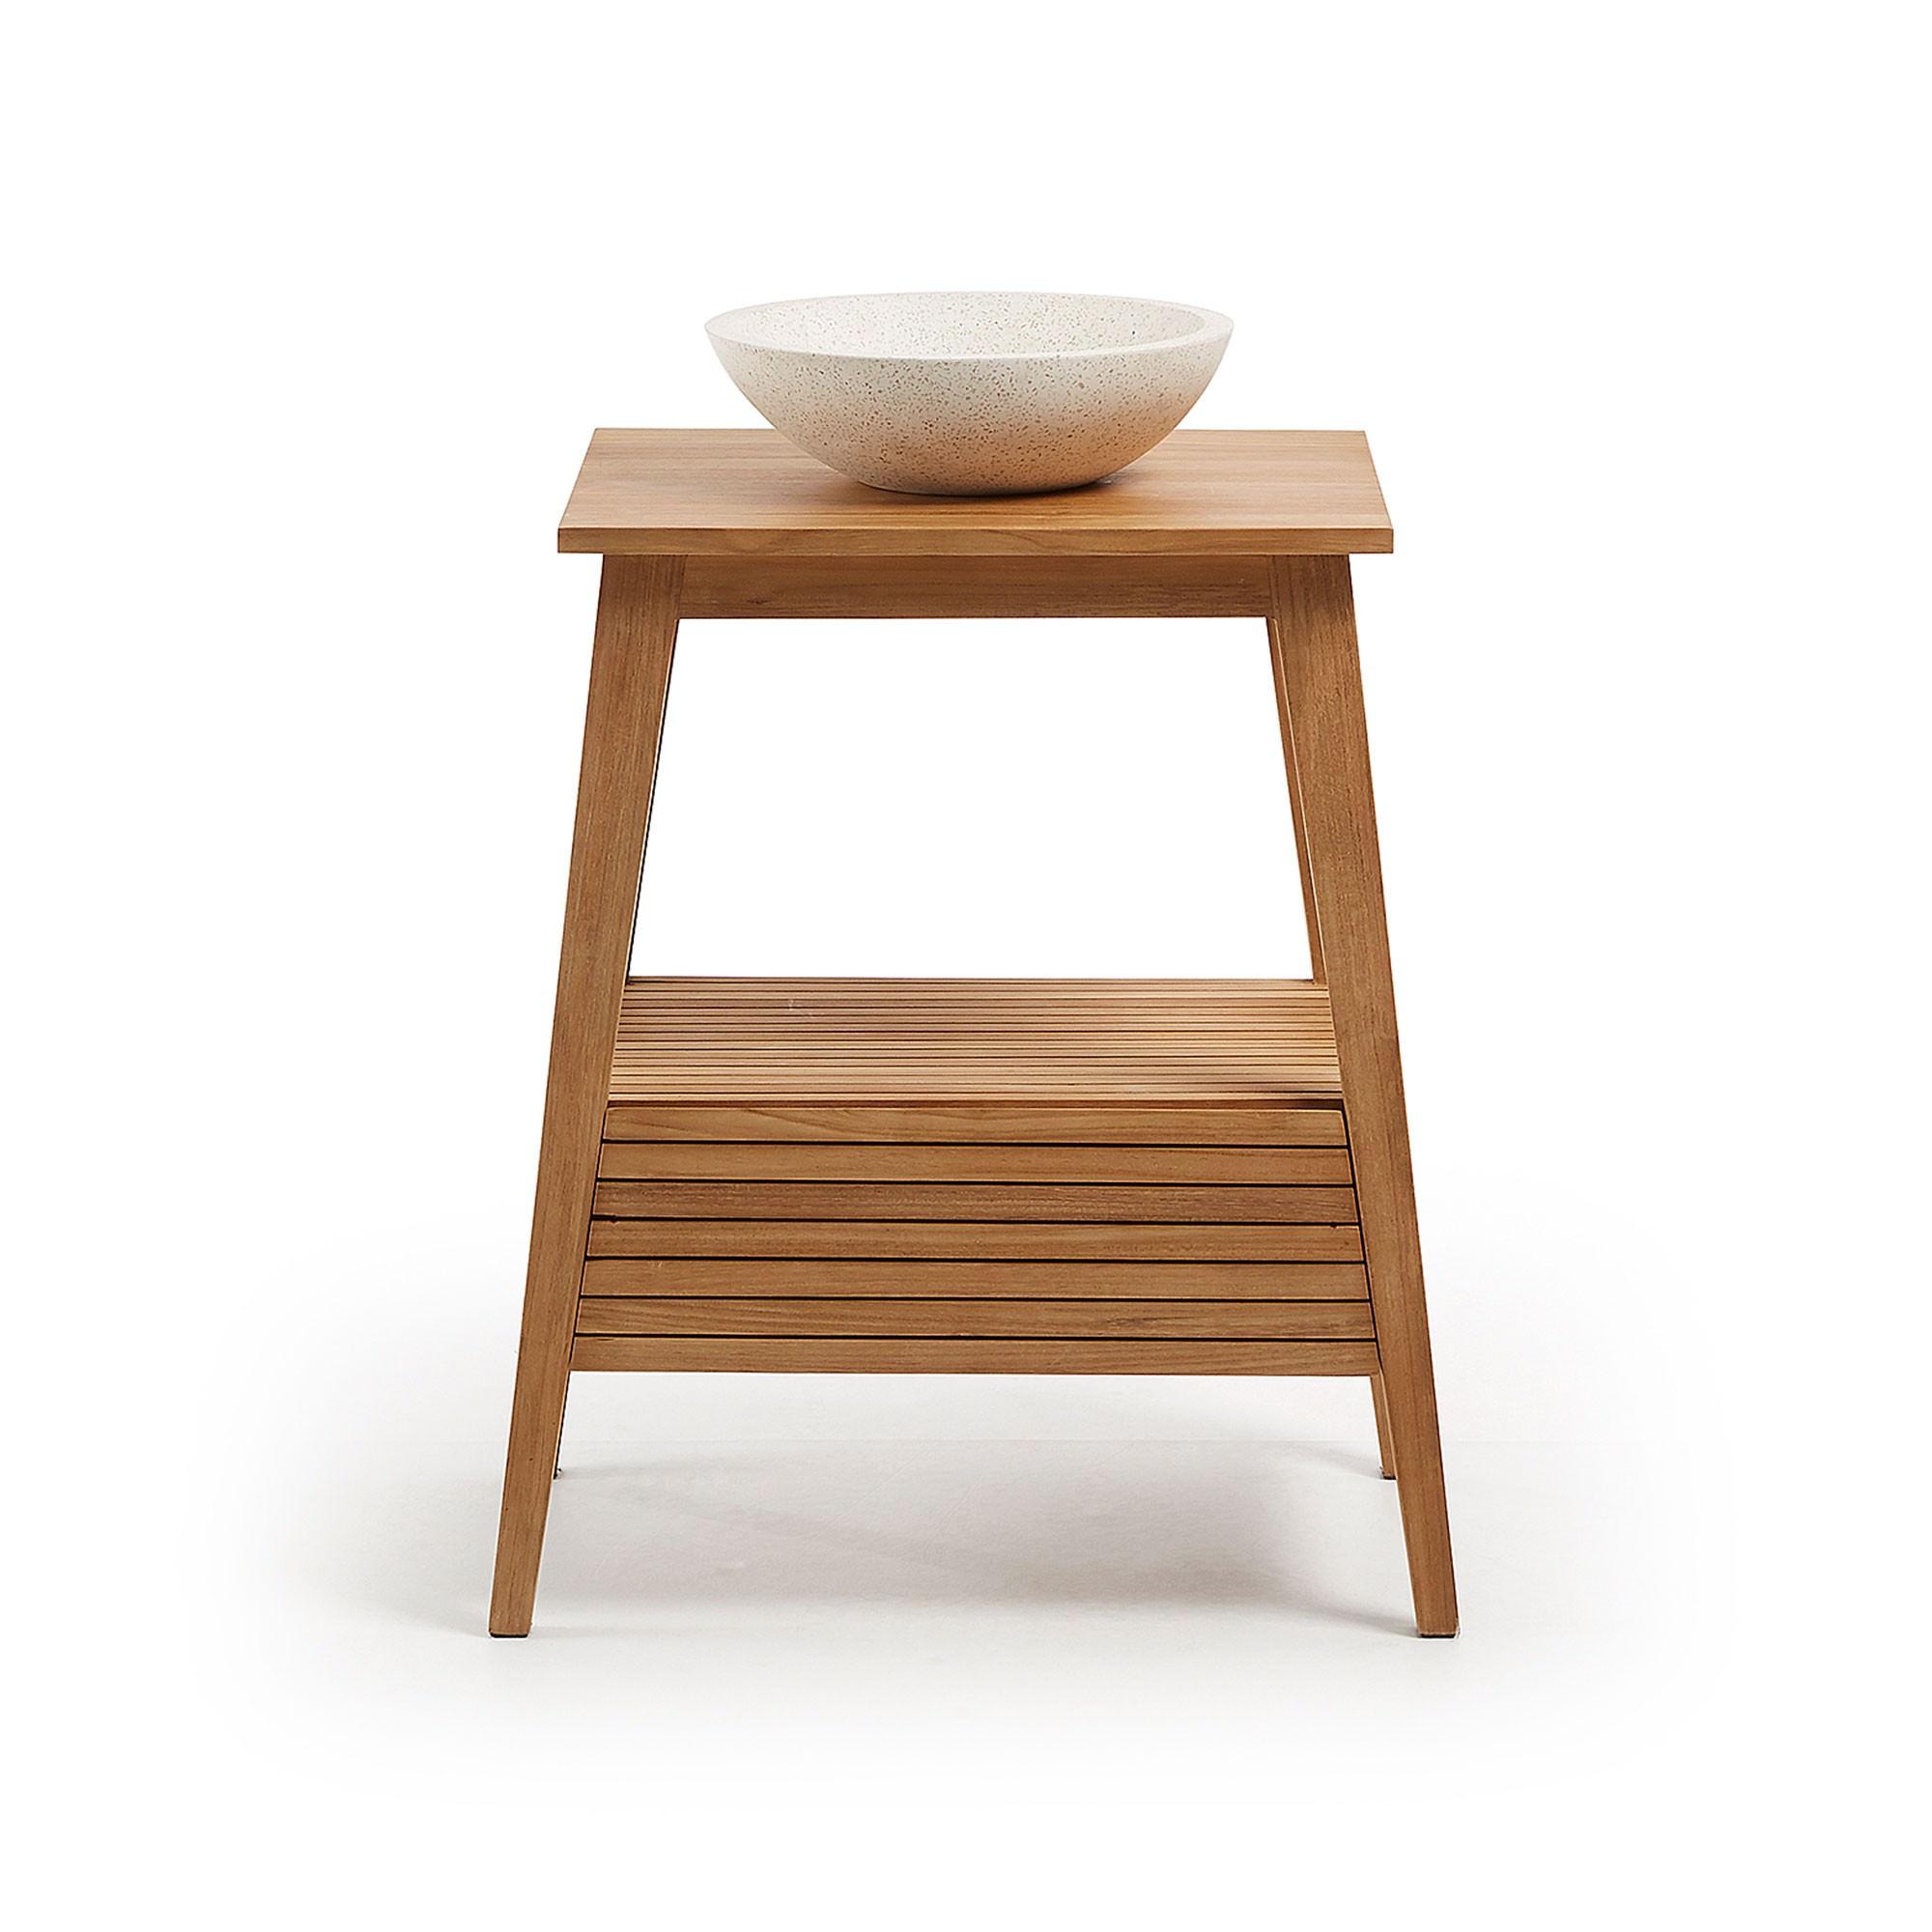 Ethel Teak Timber Bathroom Vanity with Terrazo Basin, 1 Drawer Free Standing